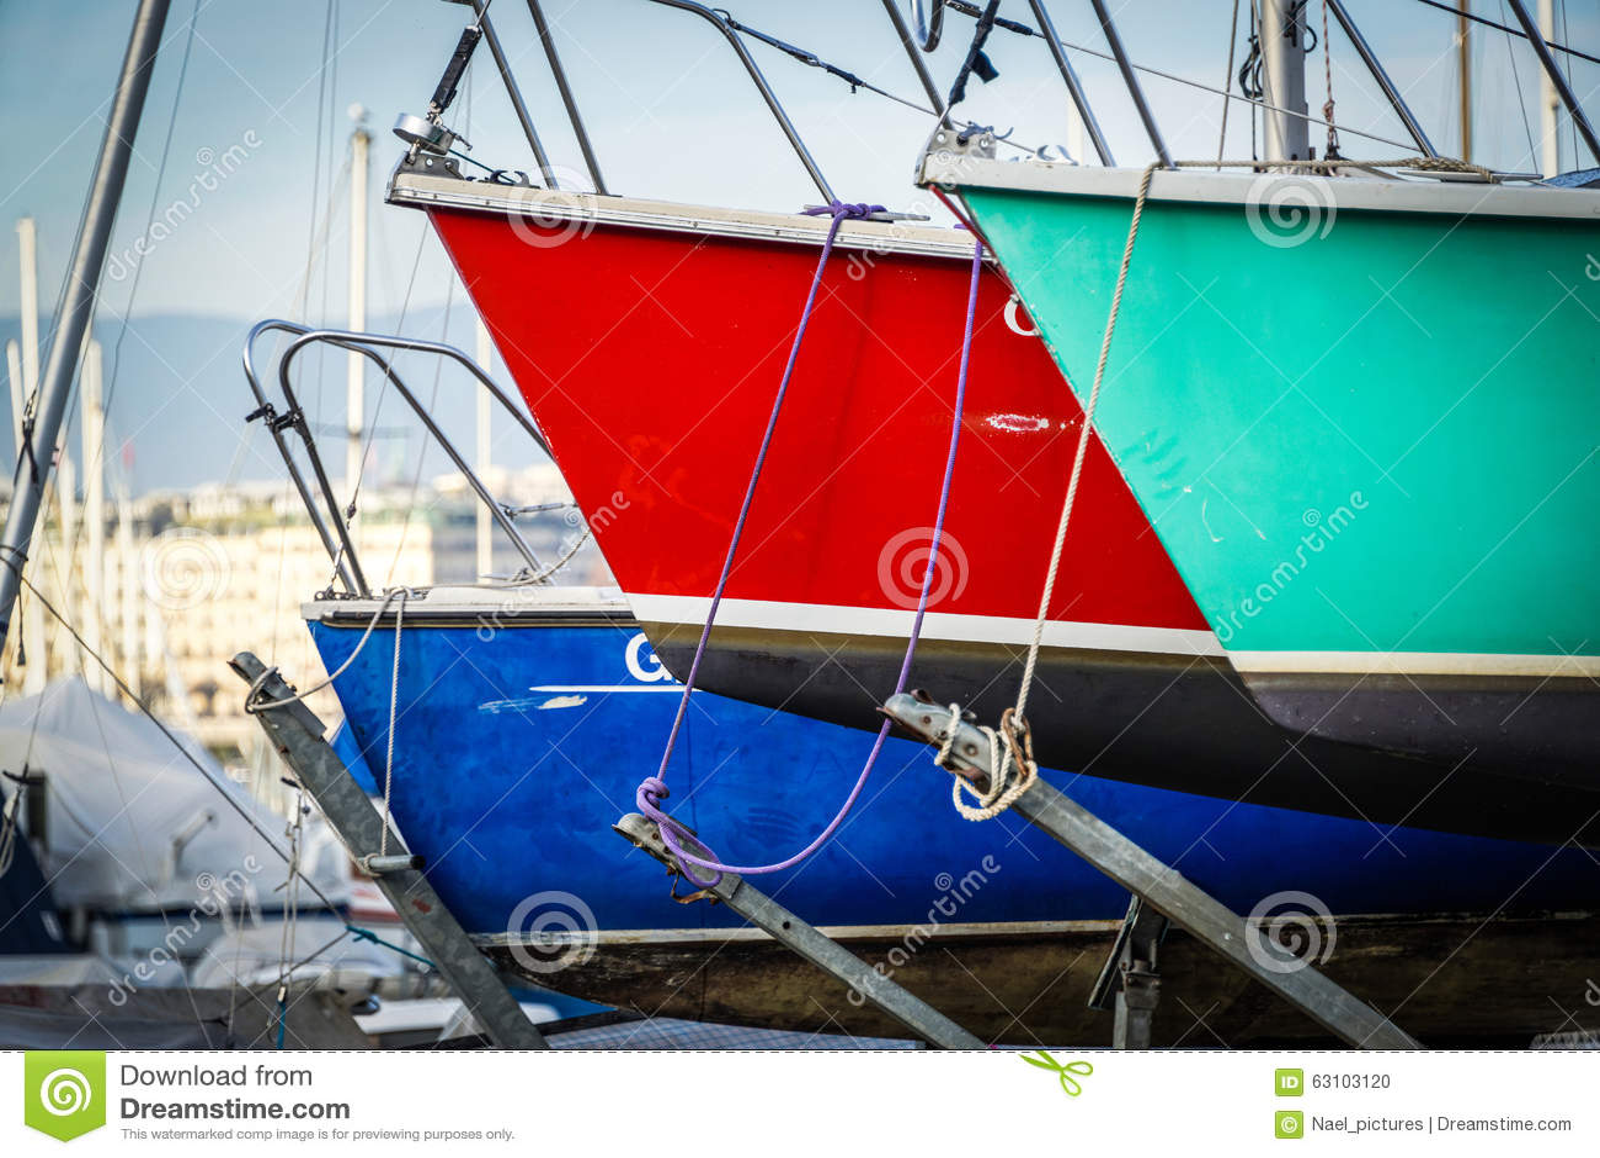 Los veleros